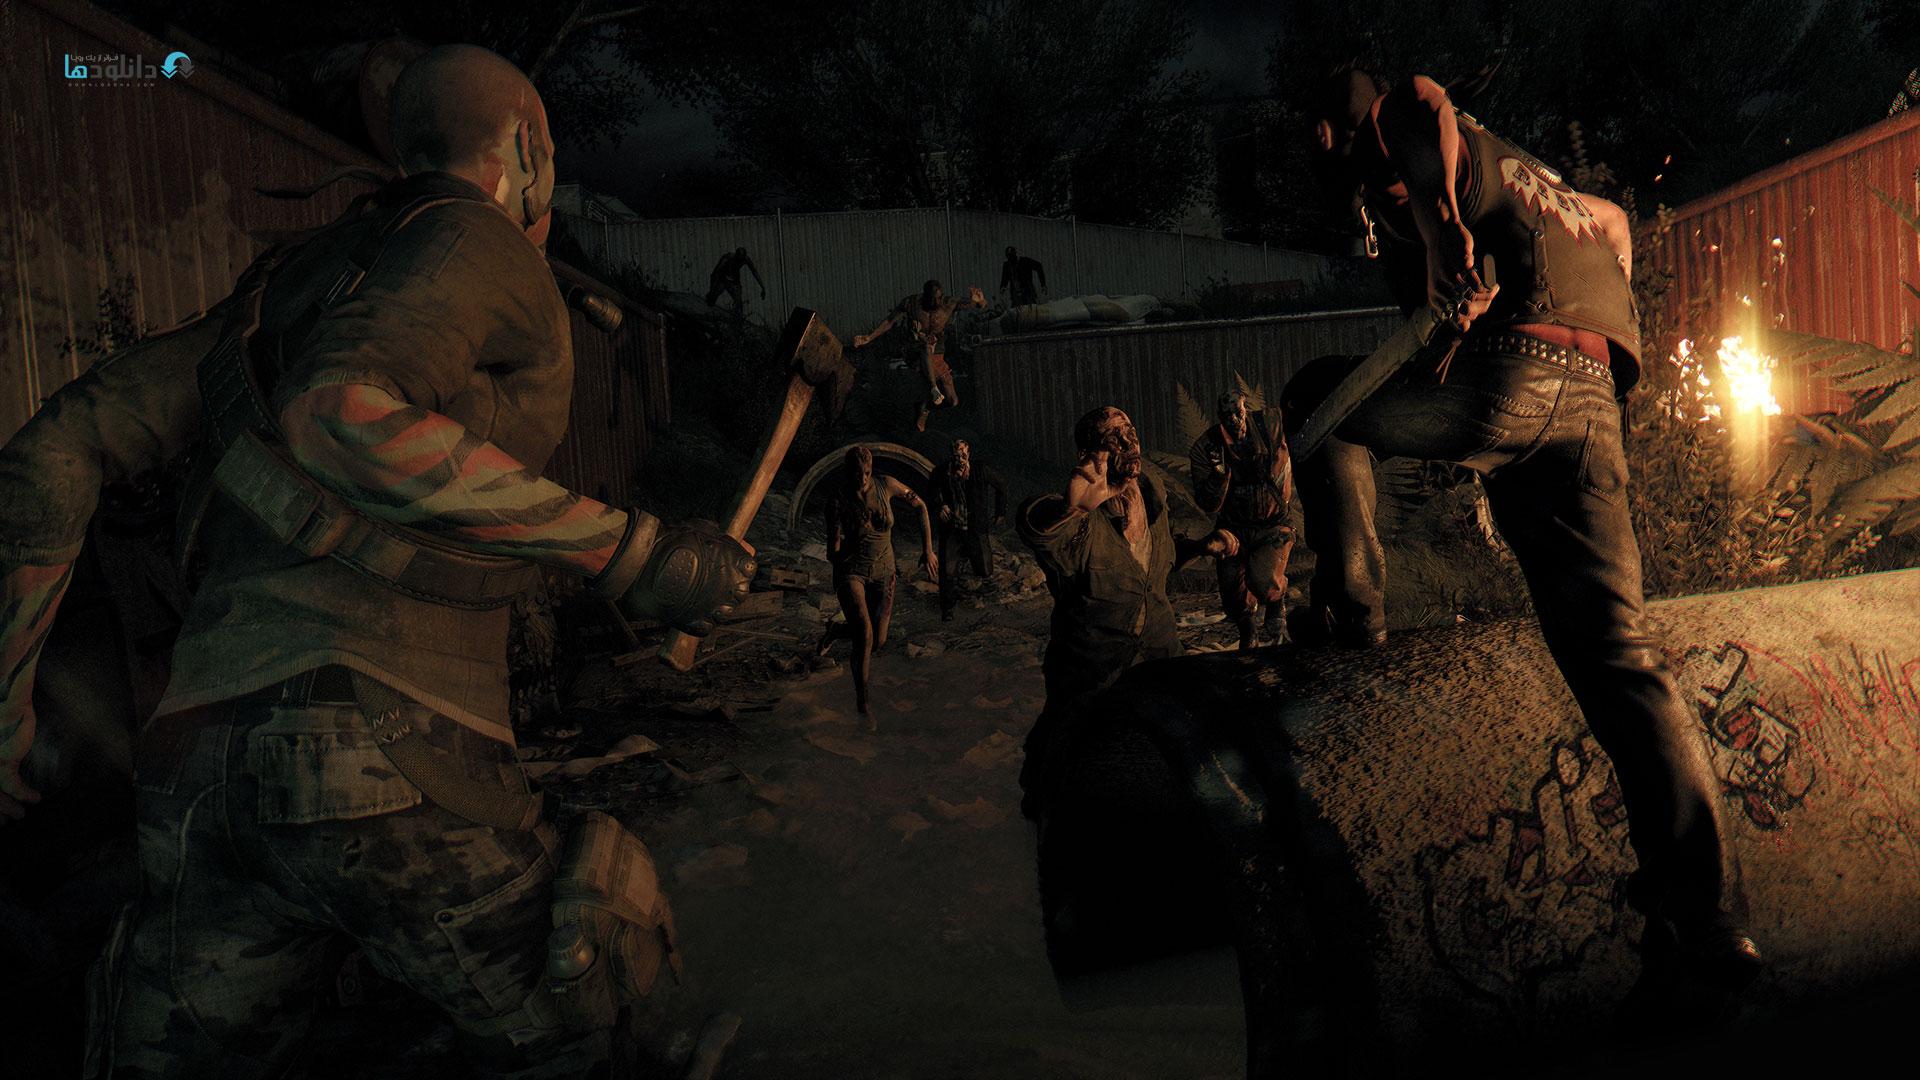 http://img5.downloadha.com/hosein/Game/January%202015/27/Dying-Light-screenshots-04-large.jpg